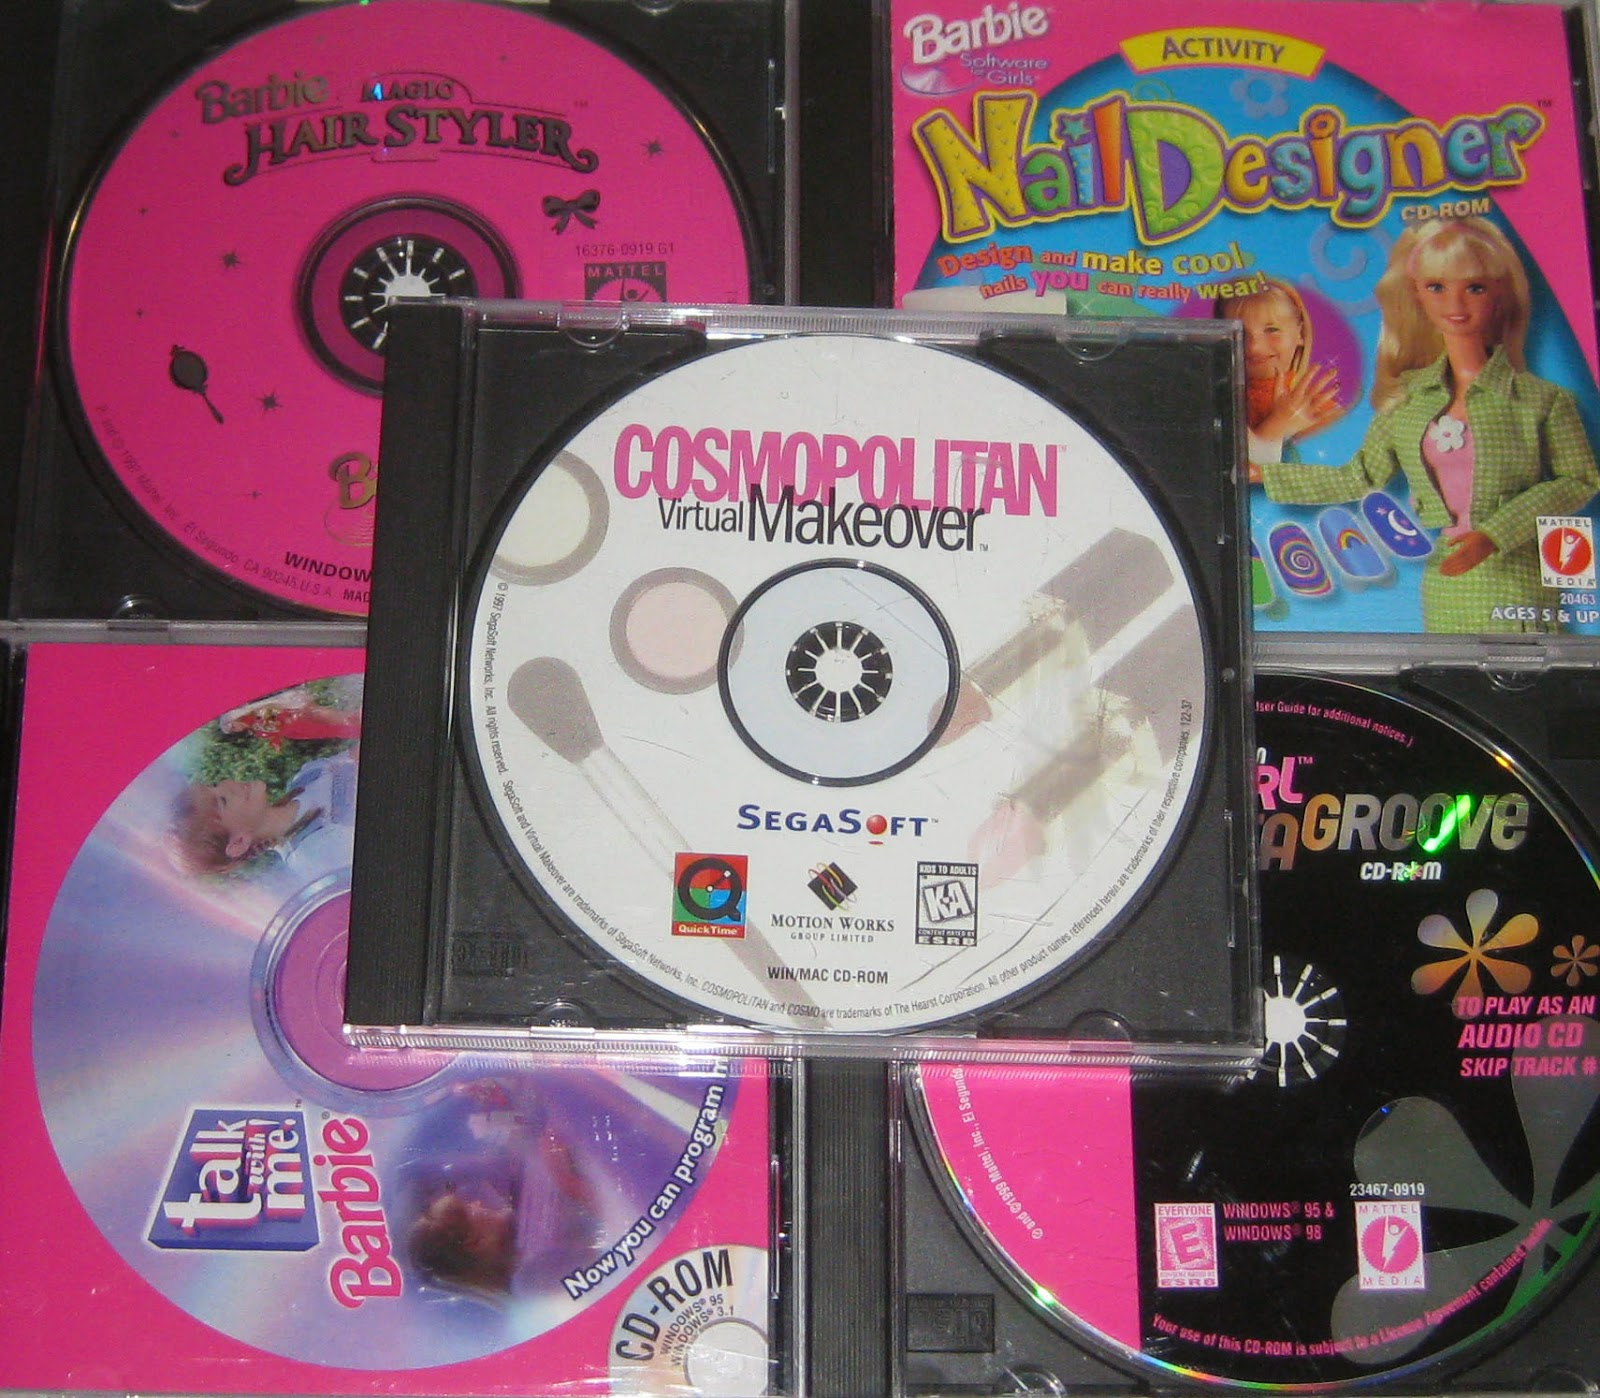 Barbie Fashion Show Game Online Free